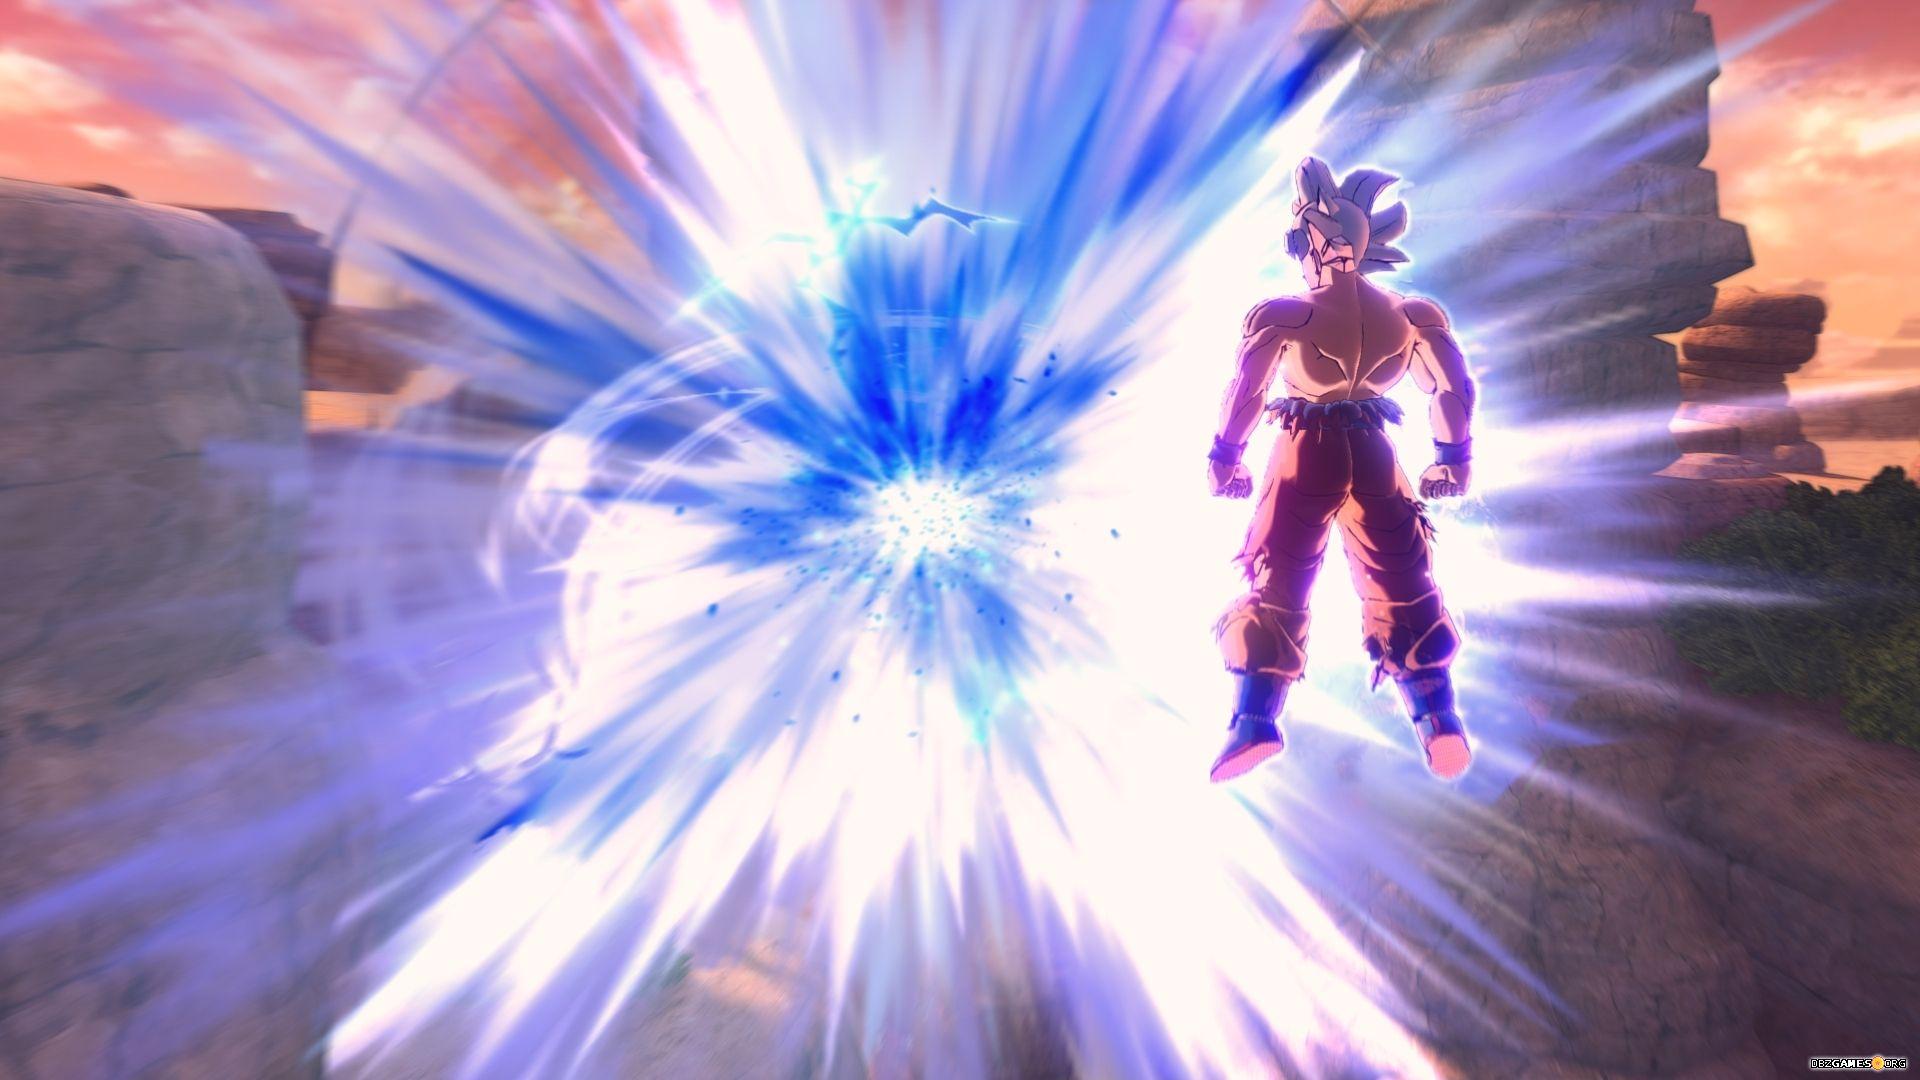 Dragon Ball Xenoverse 2: Goku Ultra Instinct and Extra Story screenshots - DBZGames.org